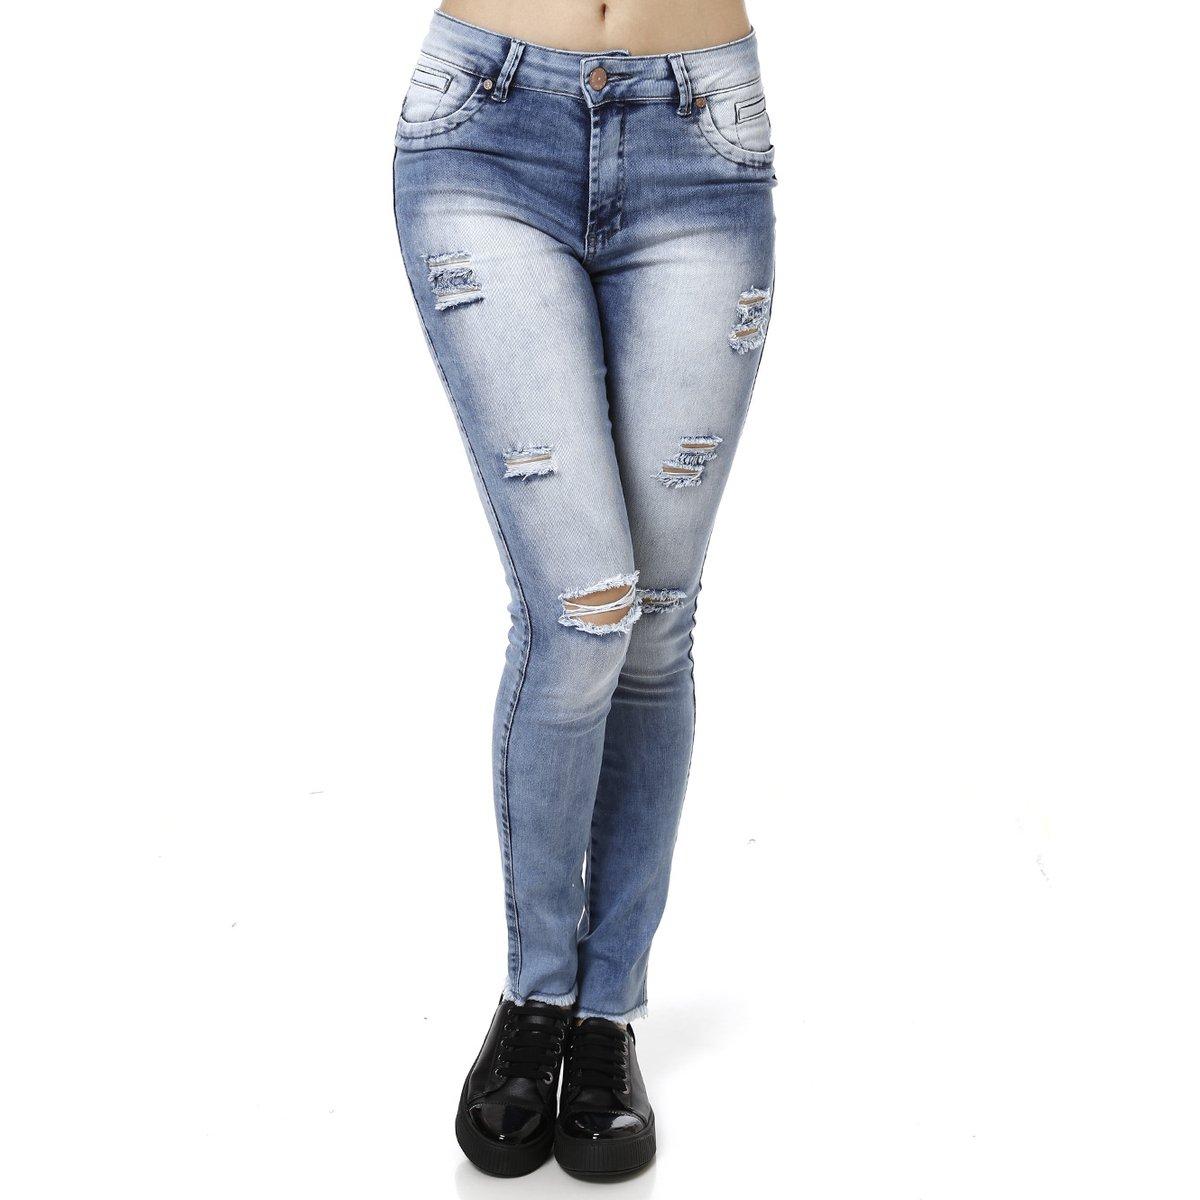 55bef9480 Calça Jeans Feminina Bivik | Netshoes